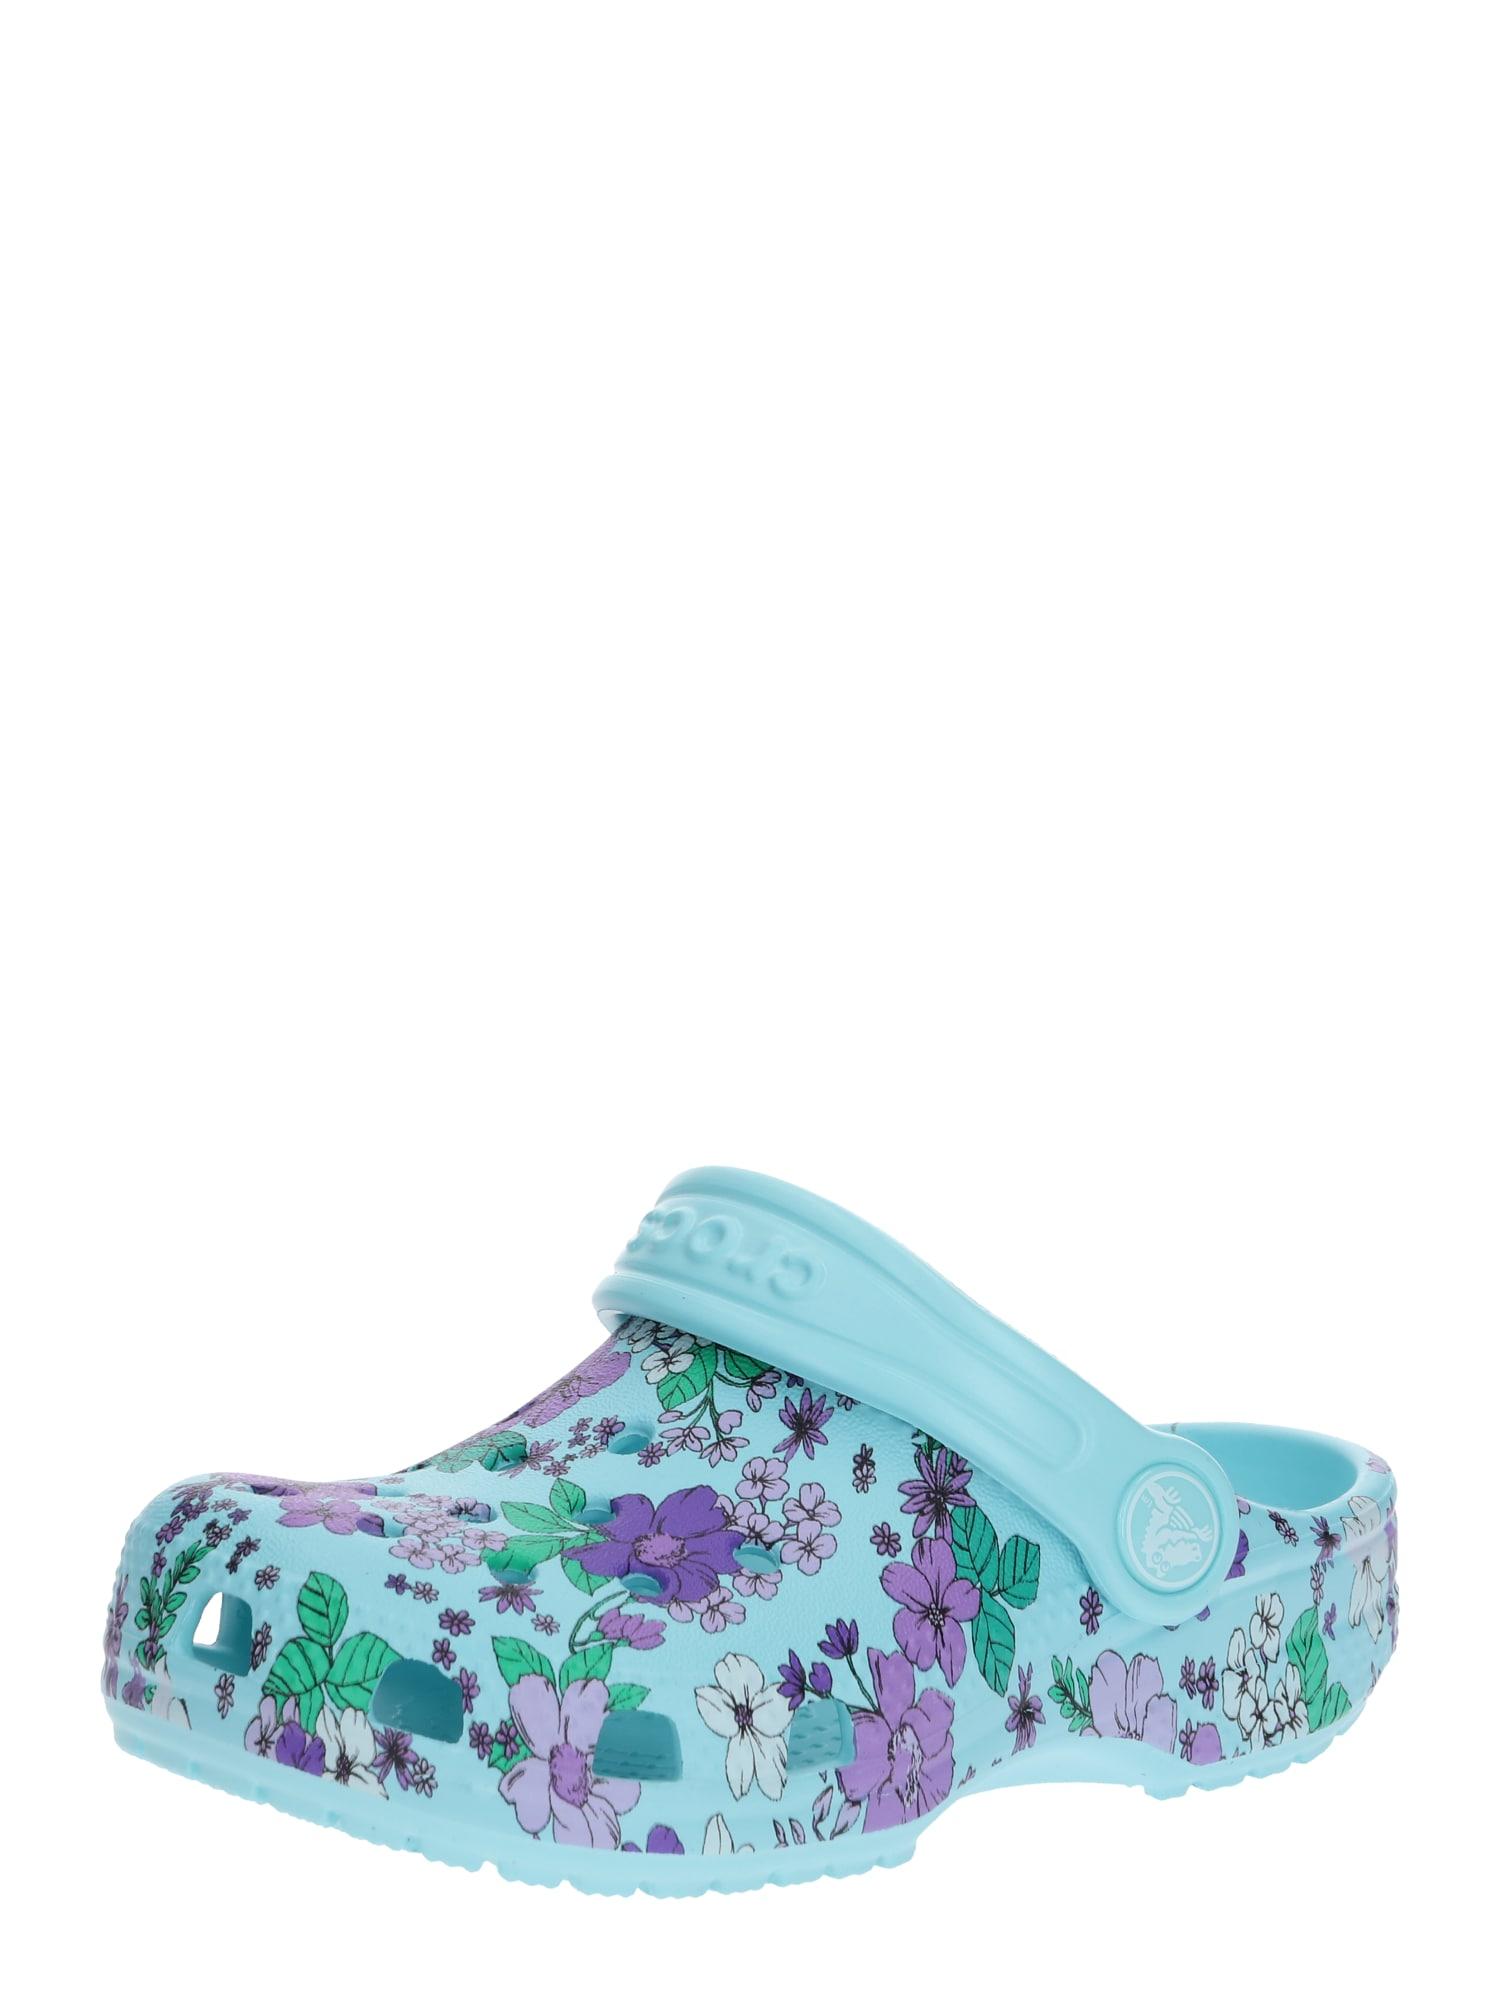 Crocs Atviri batai turkio spalva